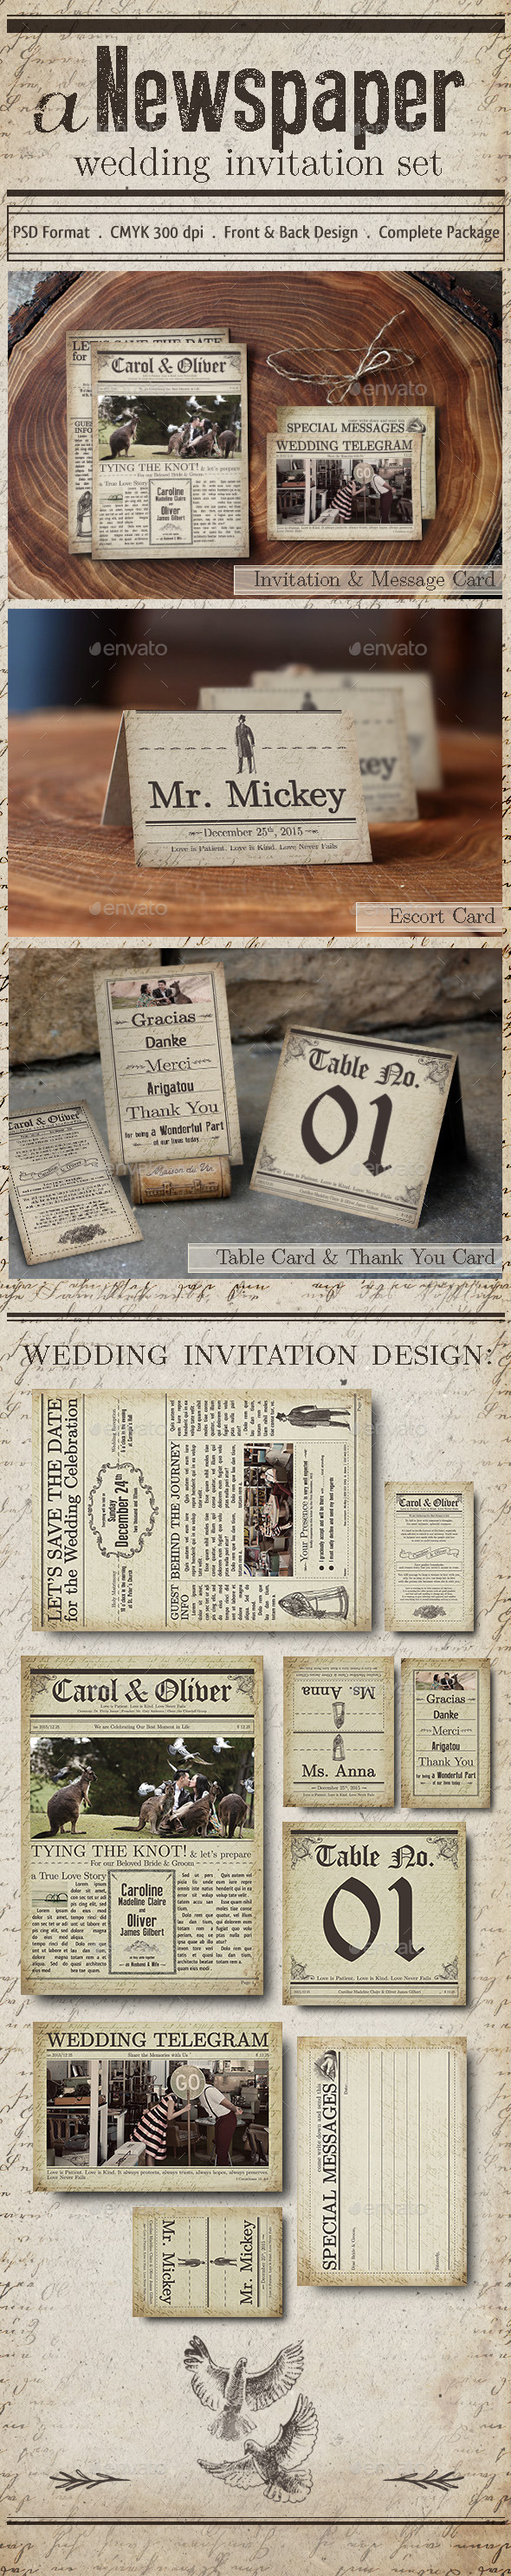 GraphicRiver Newspaper Wedding Invitation 11341666